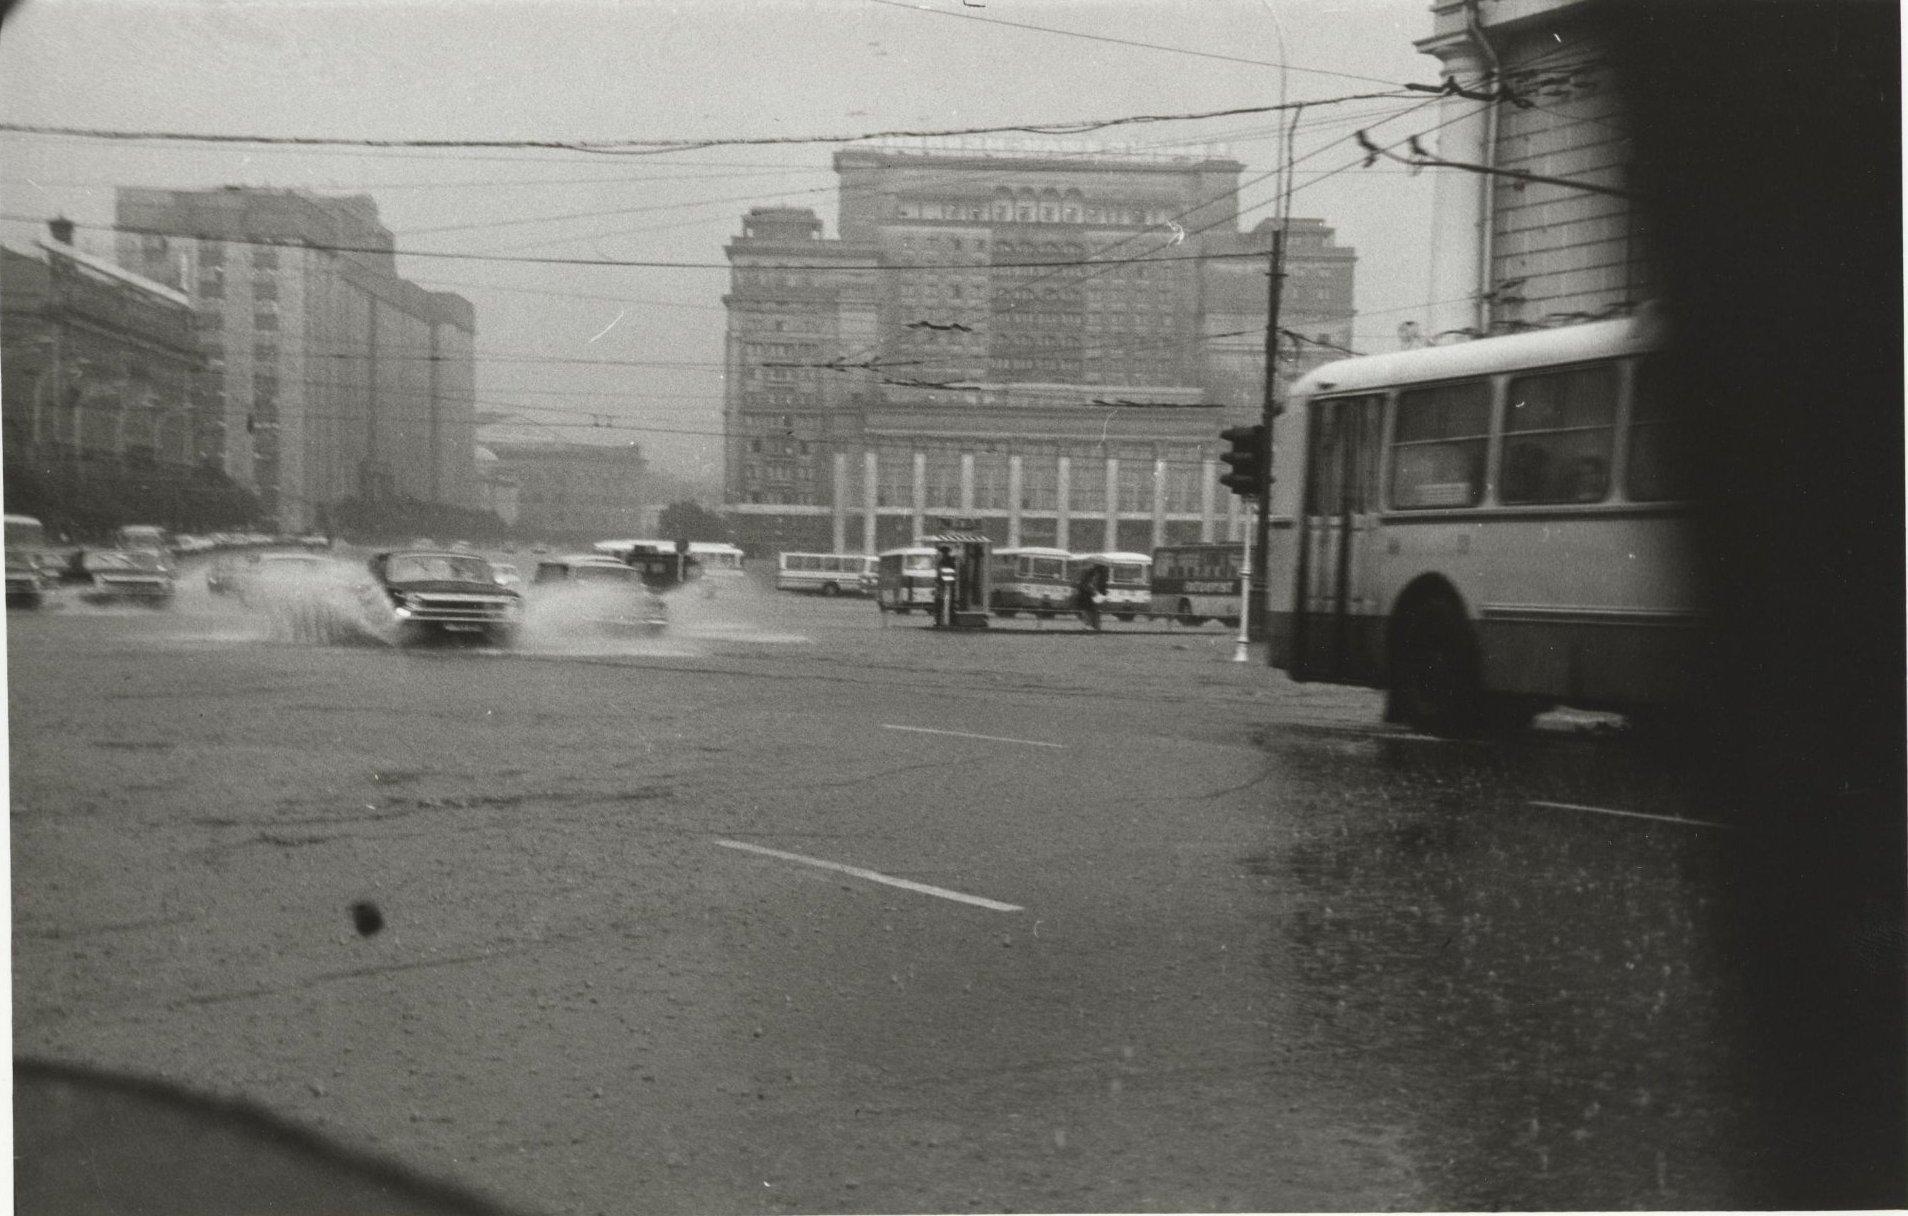 1970-е. Вид на гостиницу «Москва» и движущийся перед ней транспорт во время сильного дождя (1)